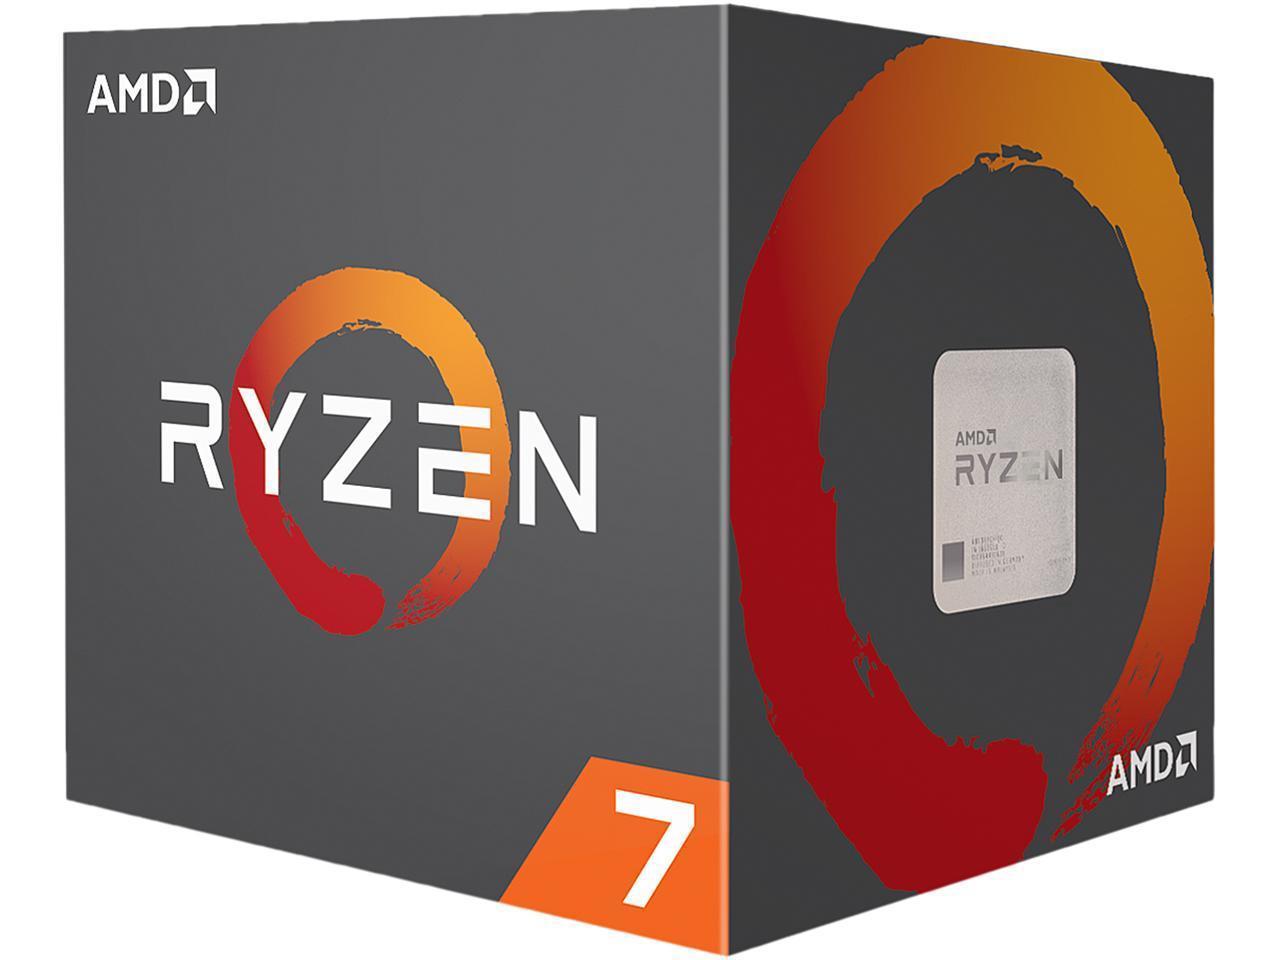 Procesor AMD Ryzen 7 2700 3.2 GHz 16MB